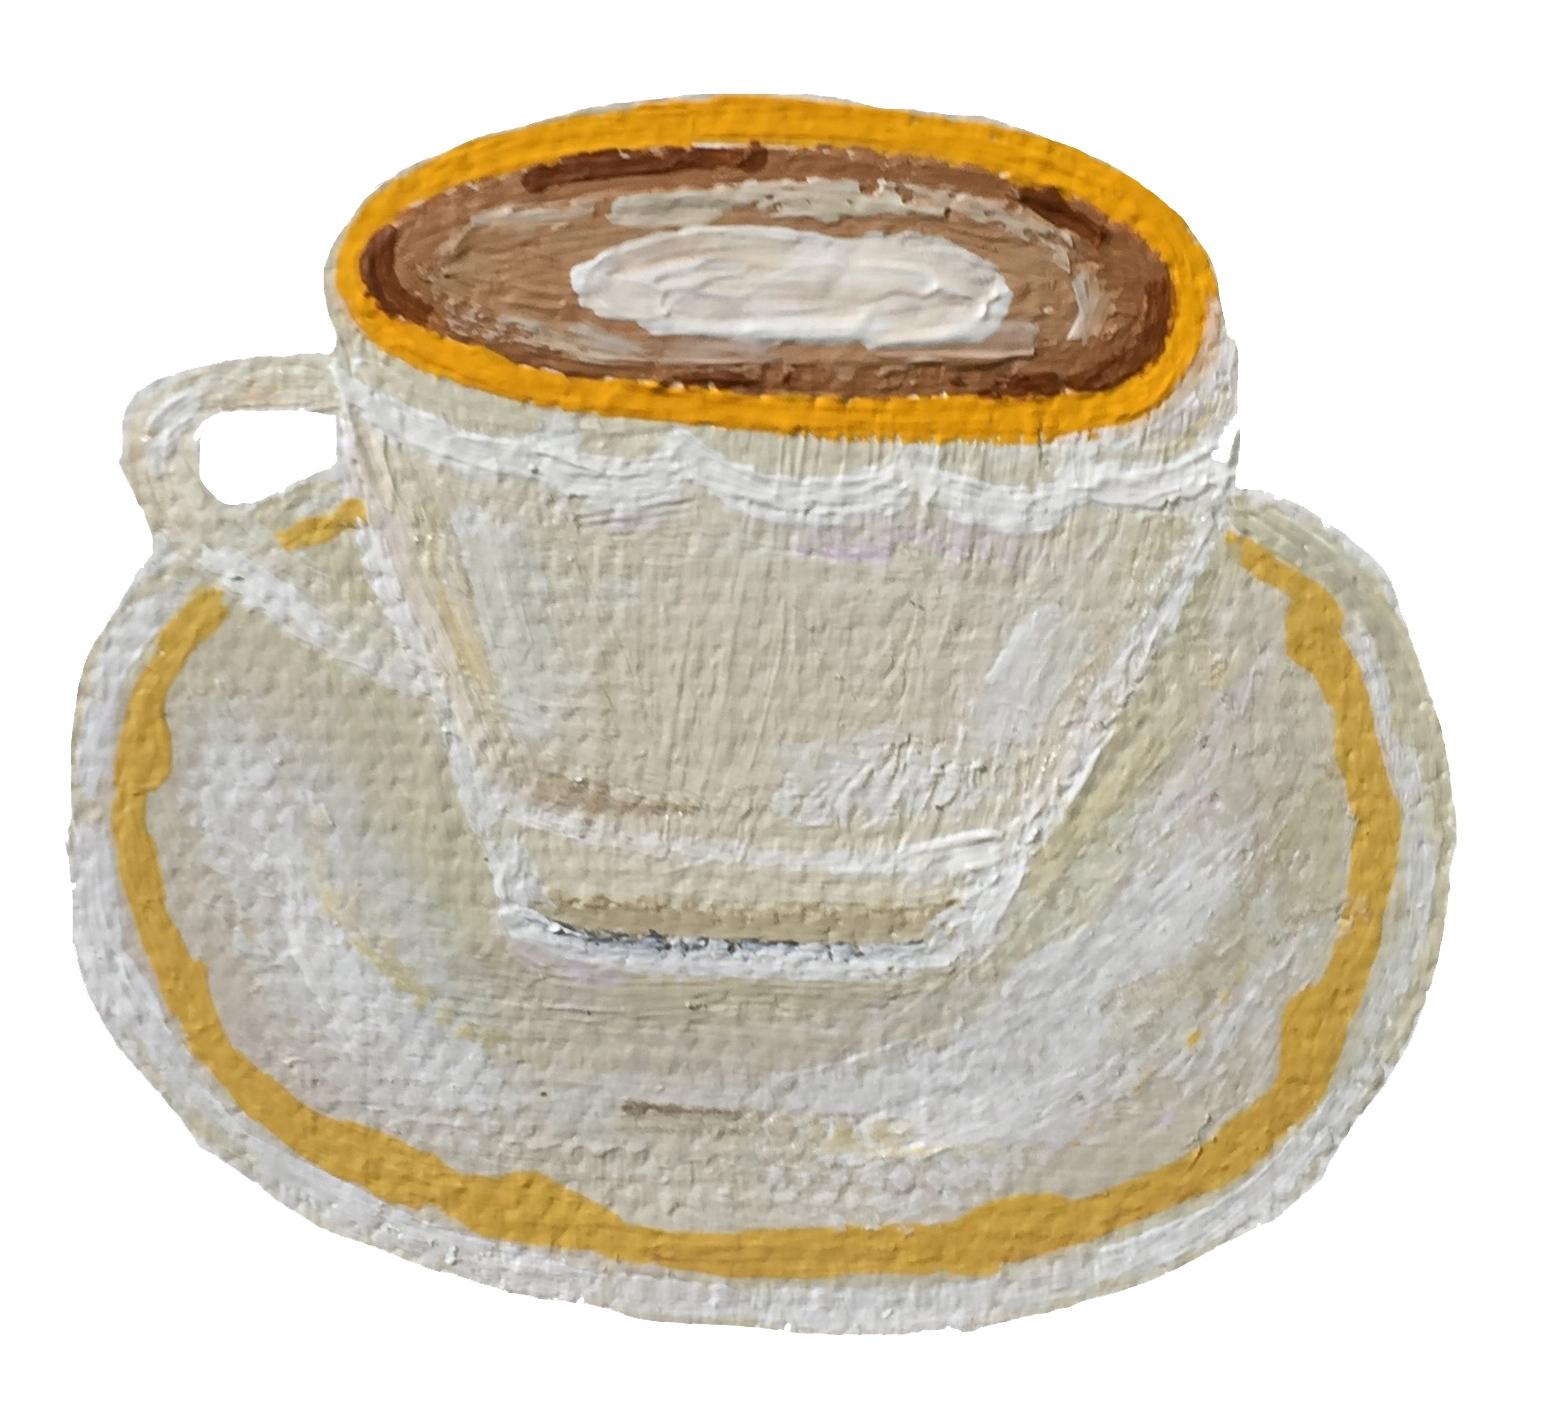 latte copy copy.jpg